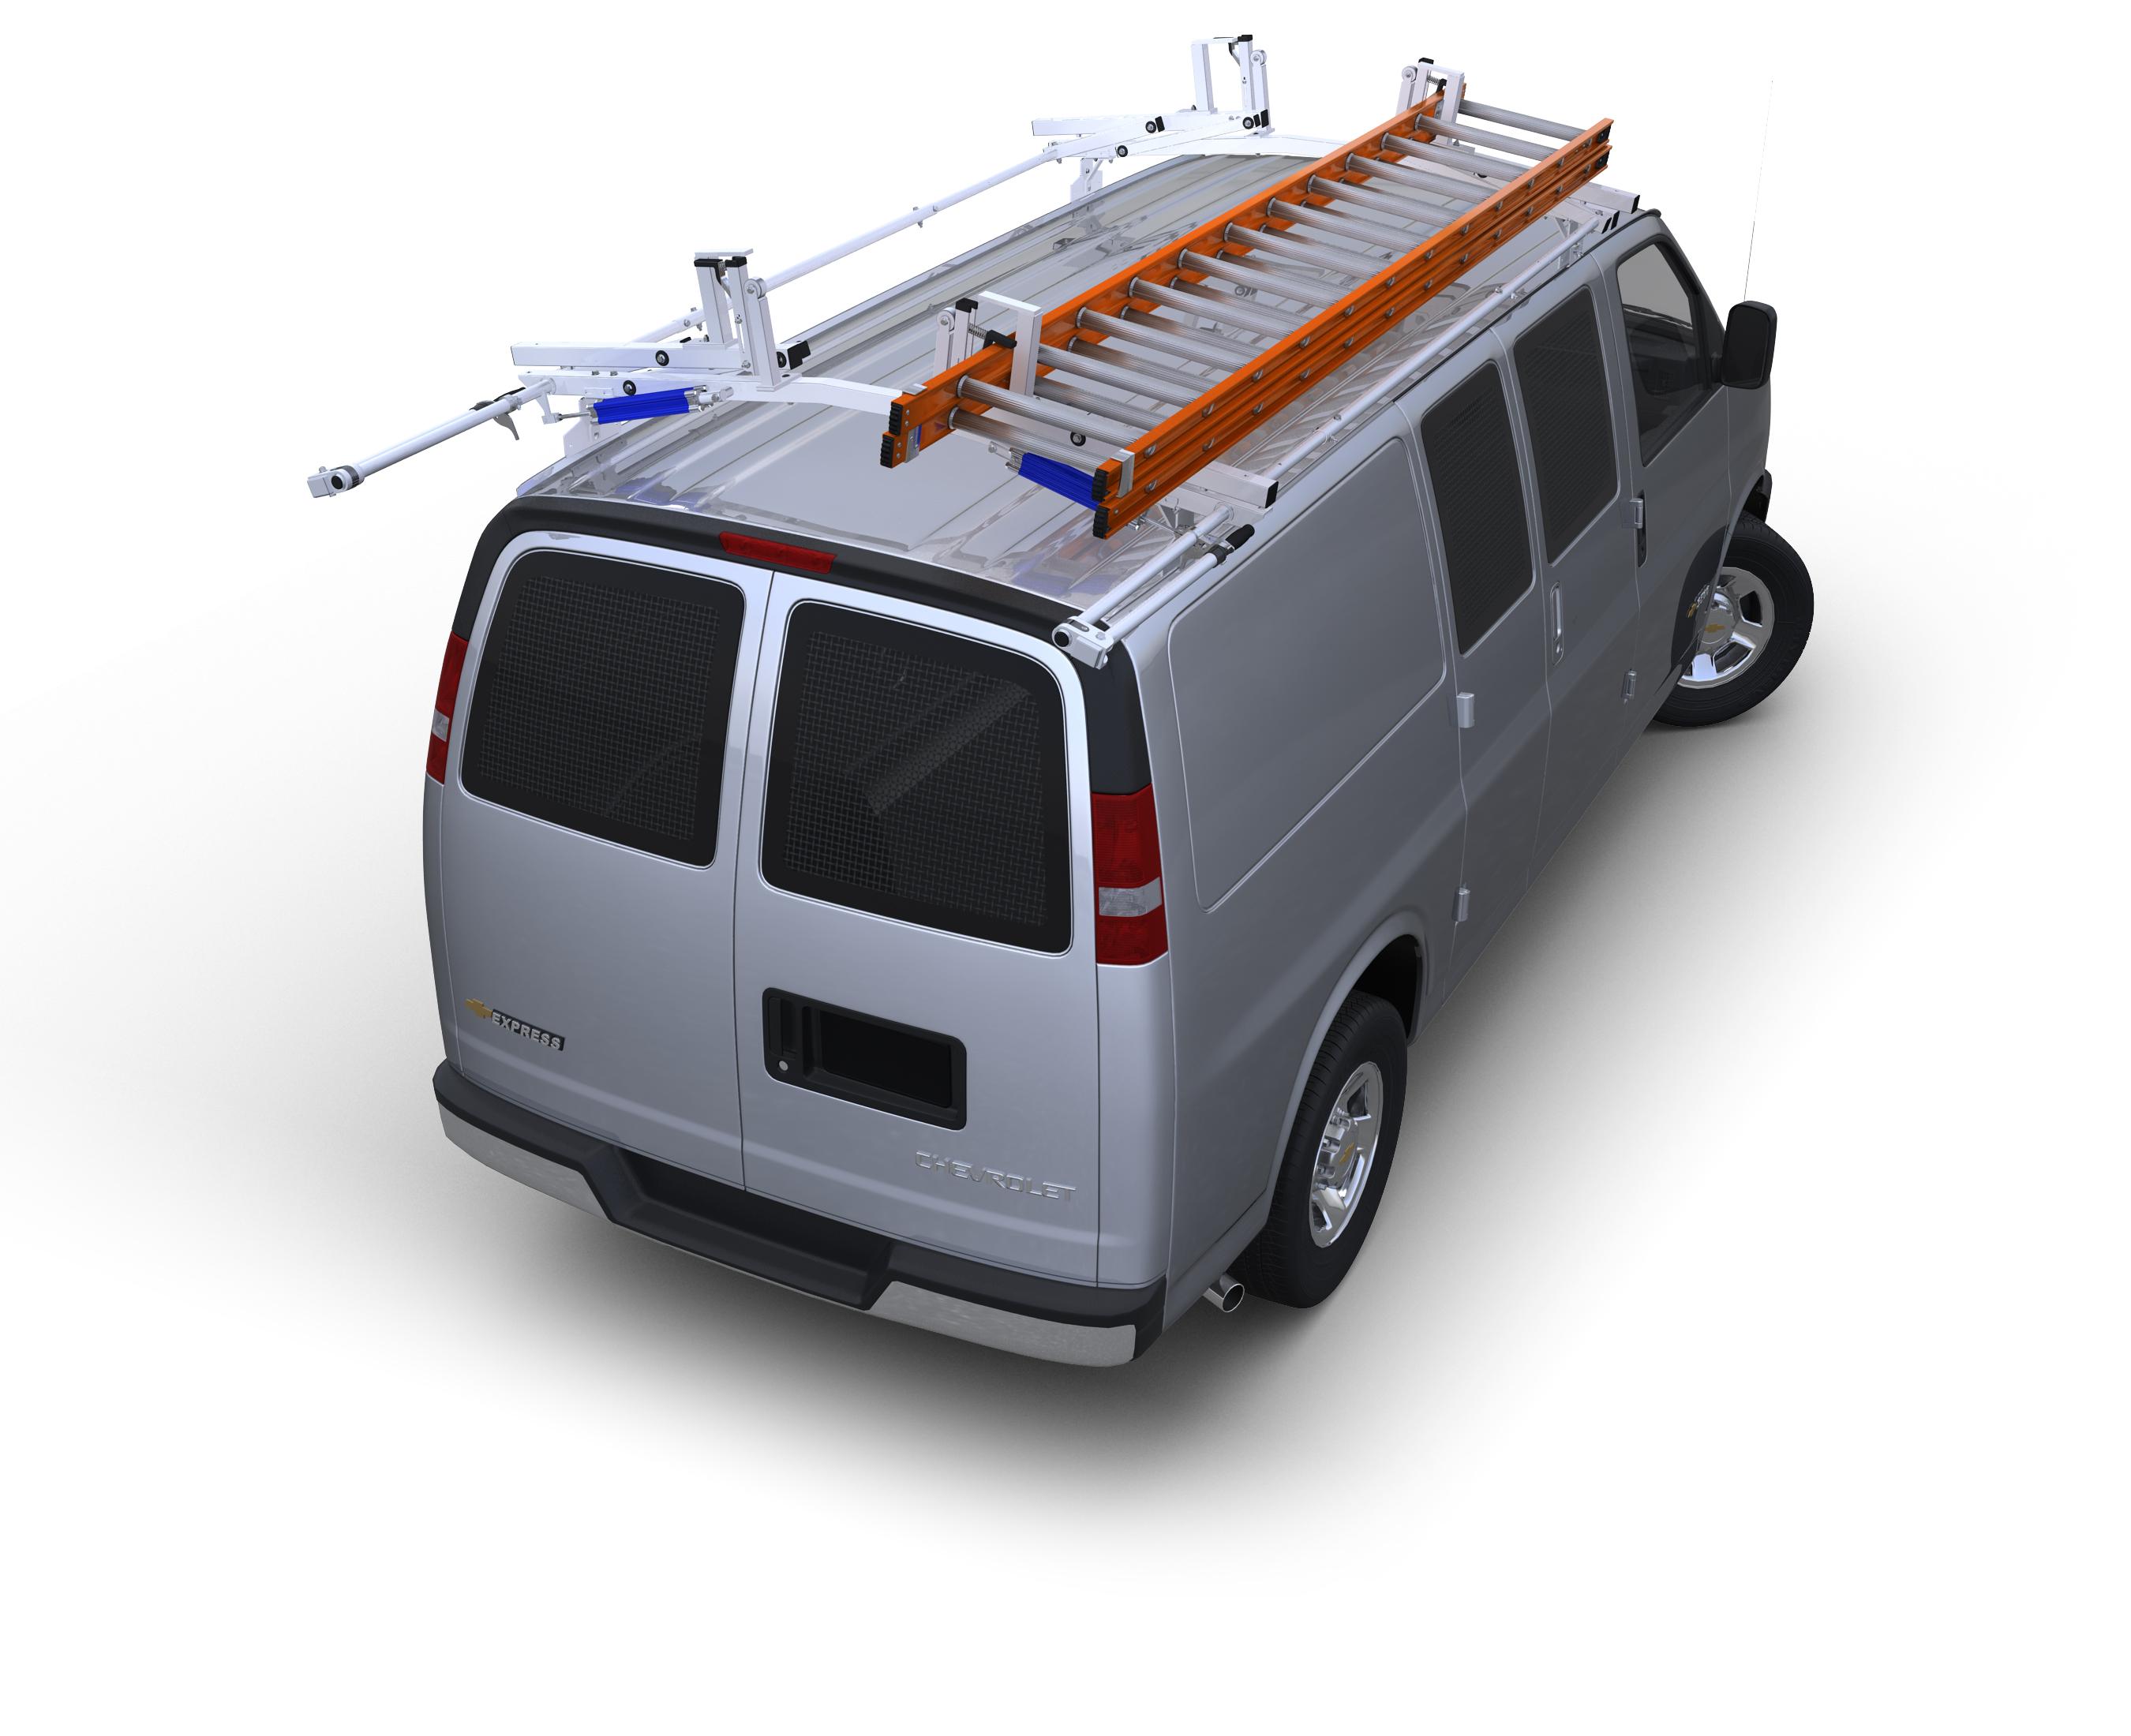 Space Saver Cab Desk